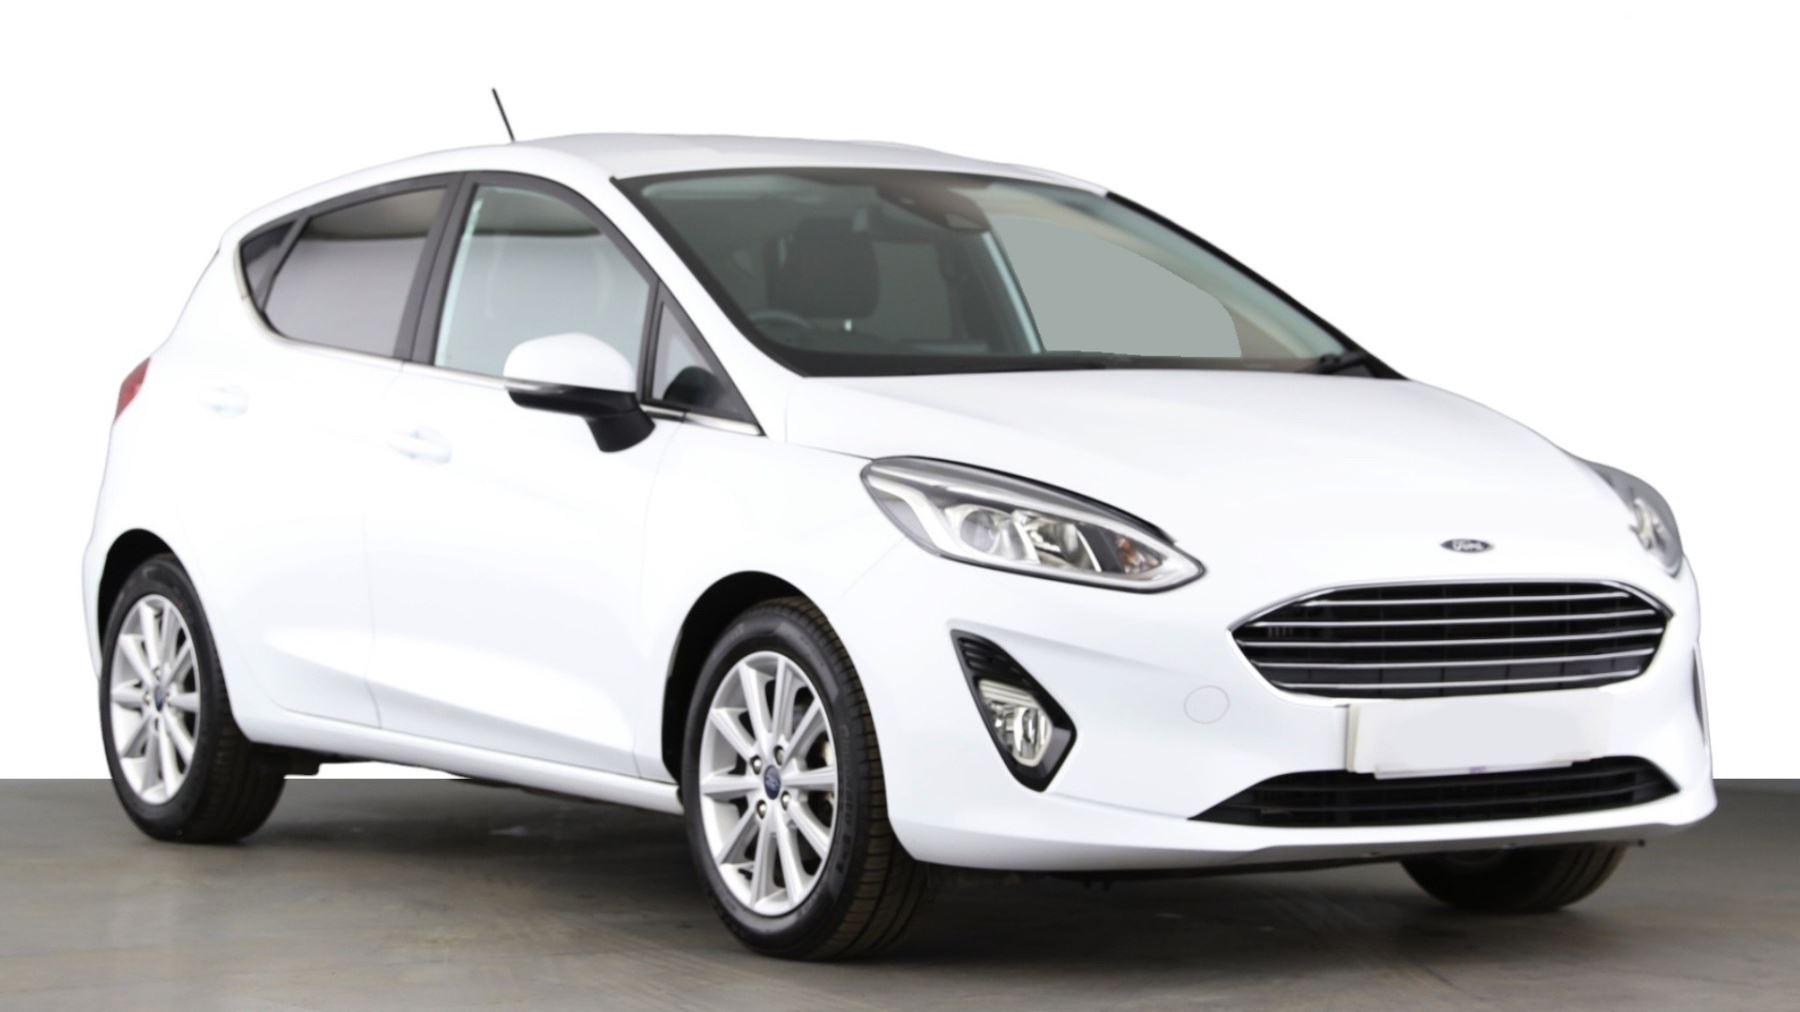 Ford Fiesta 1.0 EcoBoost Titanium 5dr, Sat Nav, Bluetooth, Hatchback (2018)